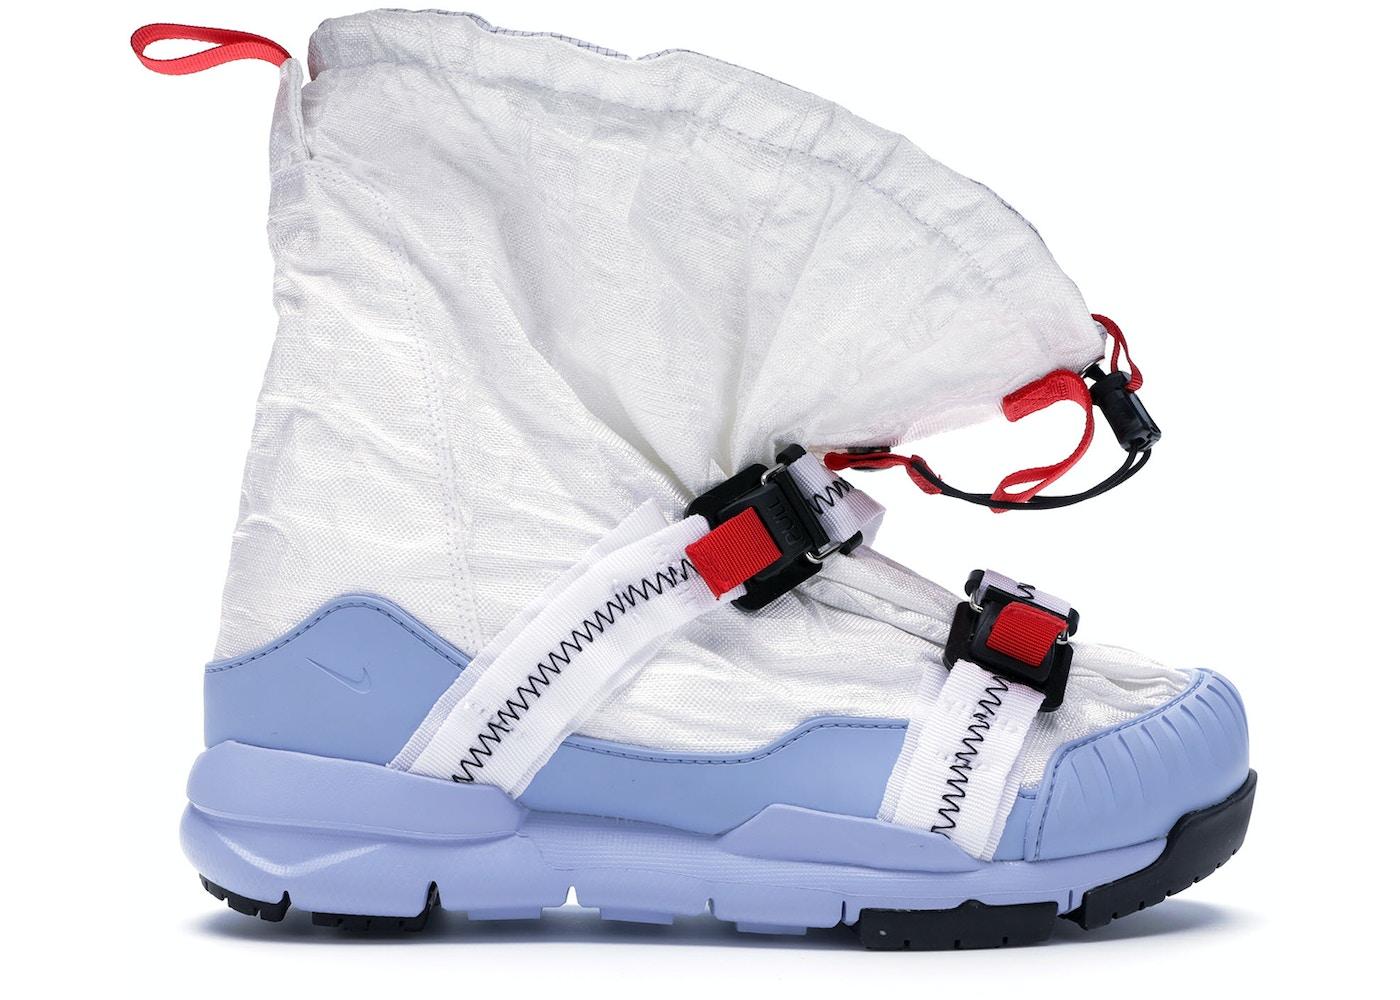 quality design e3bc8 34546 Nike Mars Yard Overshoe Tom Sachs